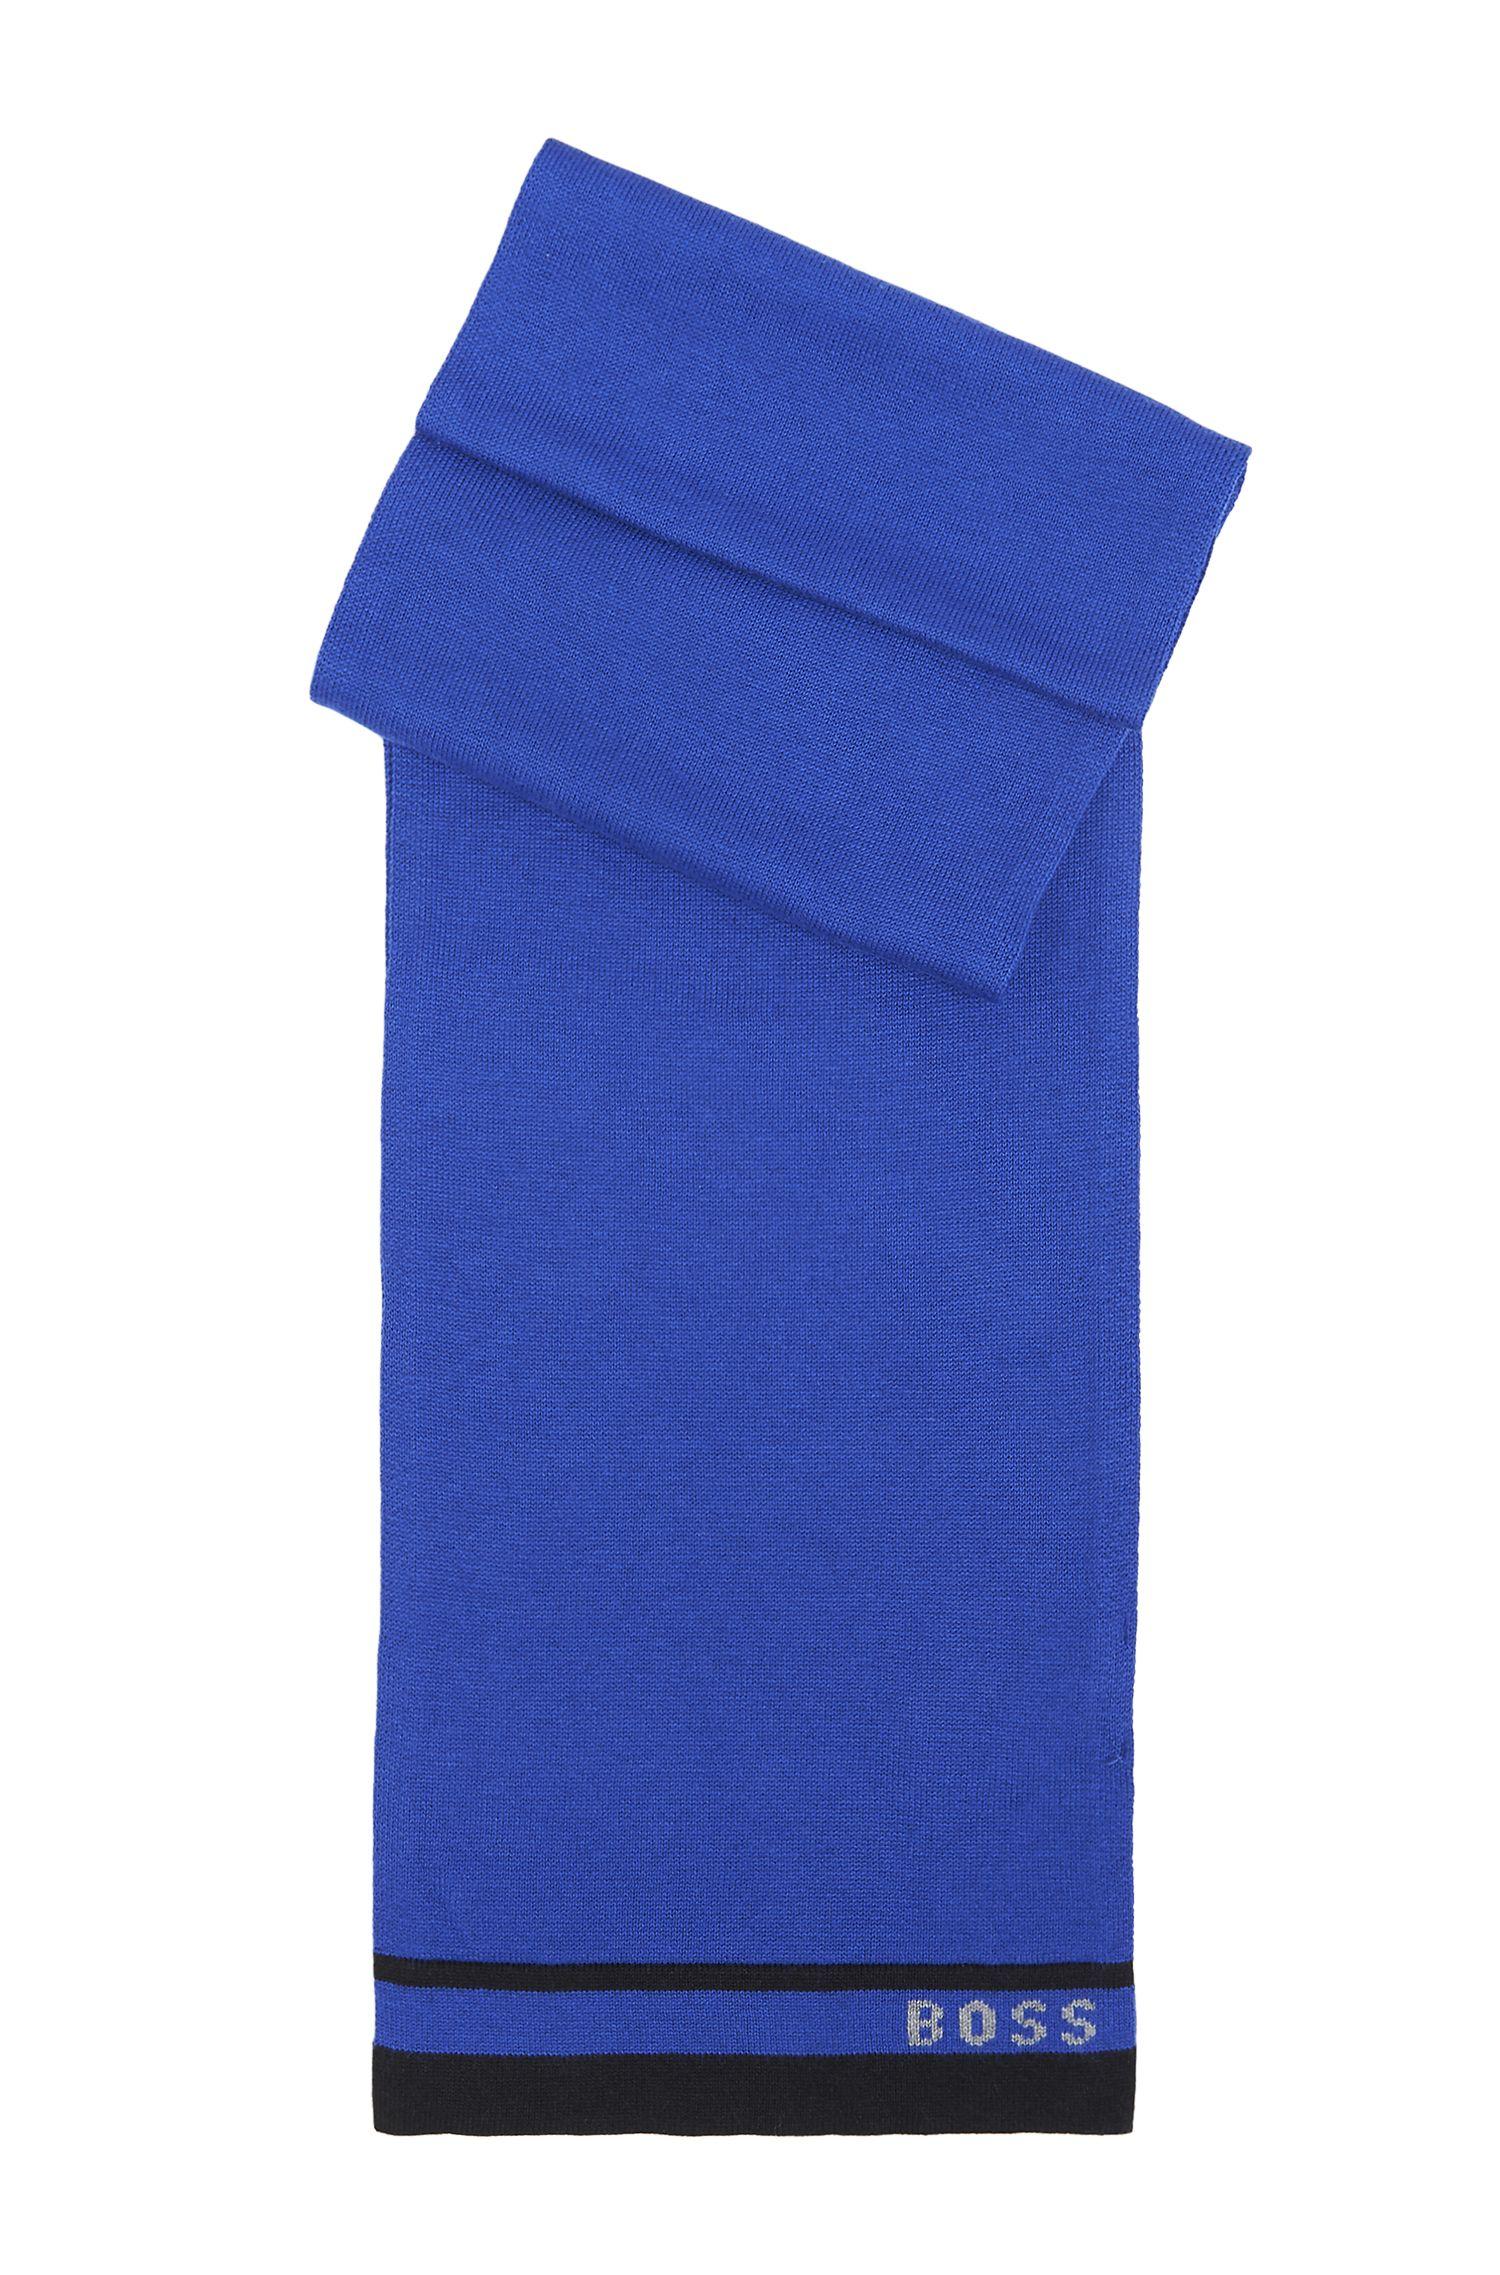 'J21109' | Knit Cotton-Wool Blend Scarf